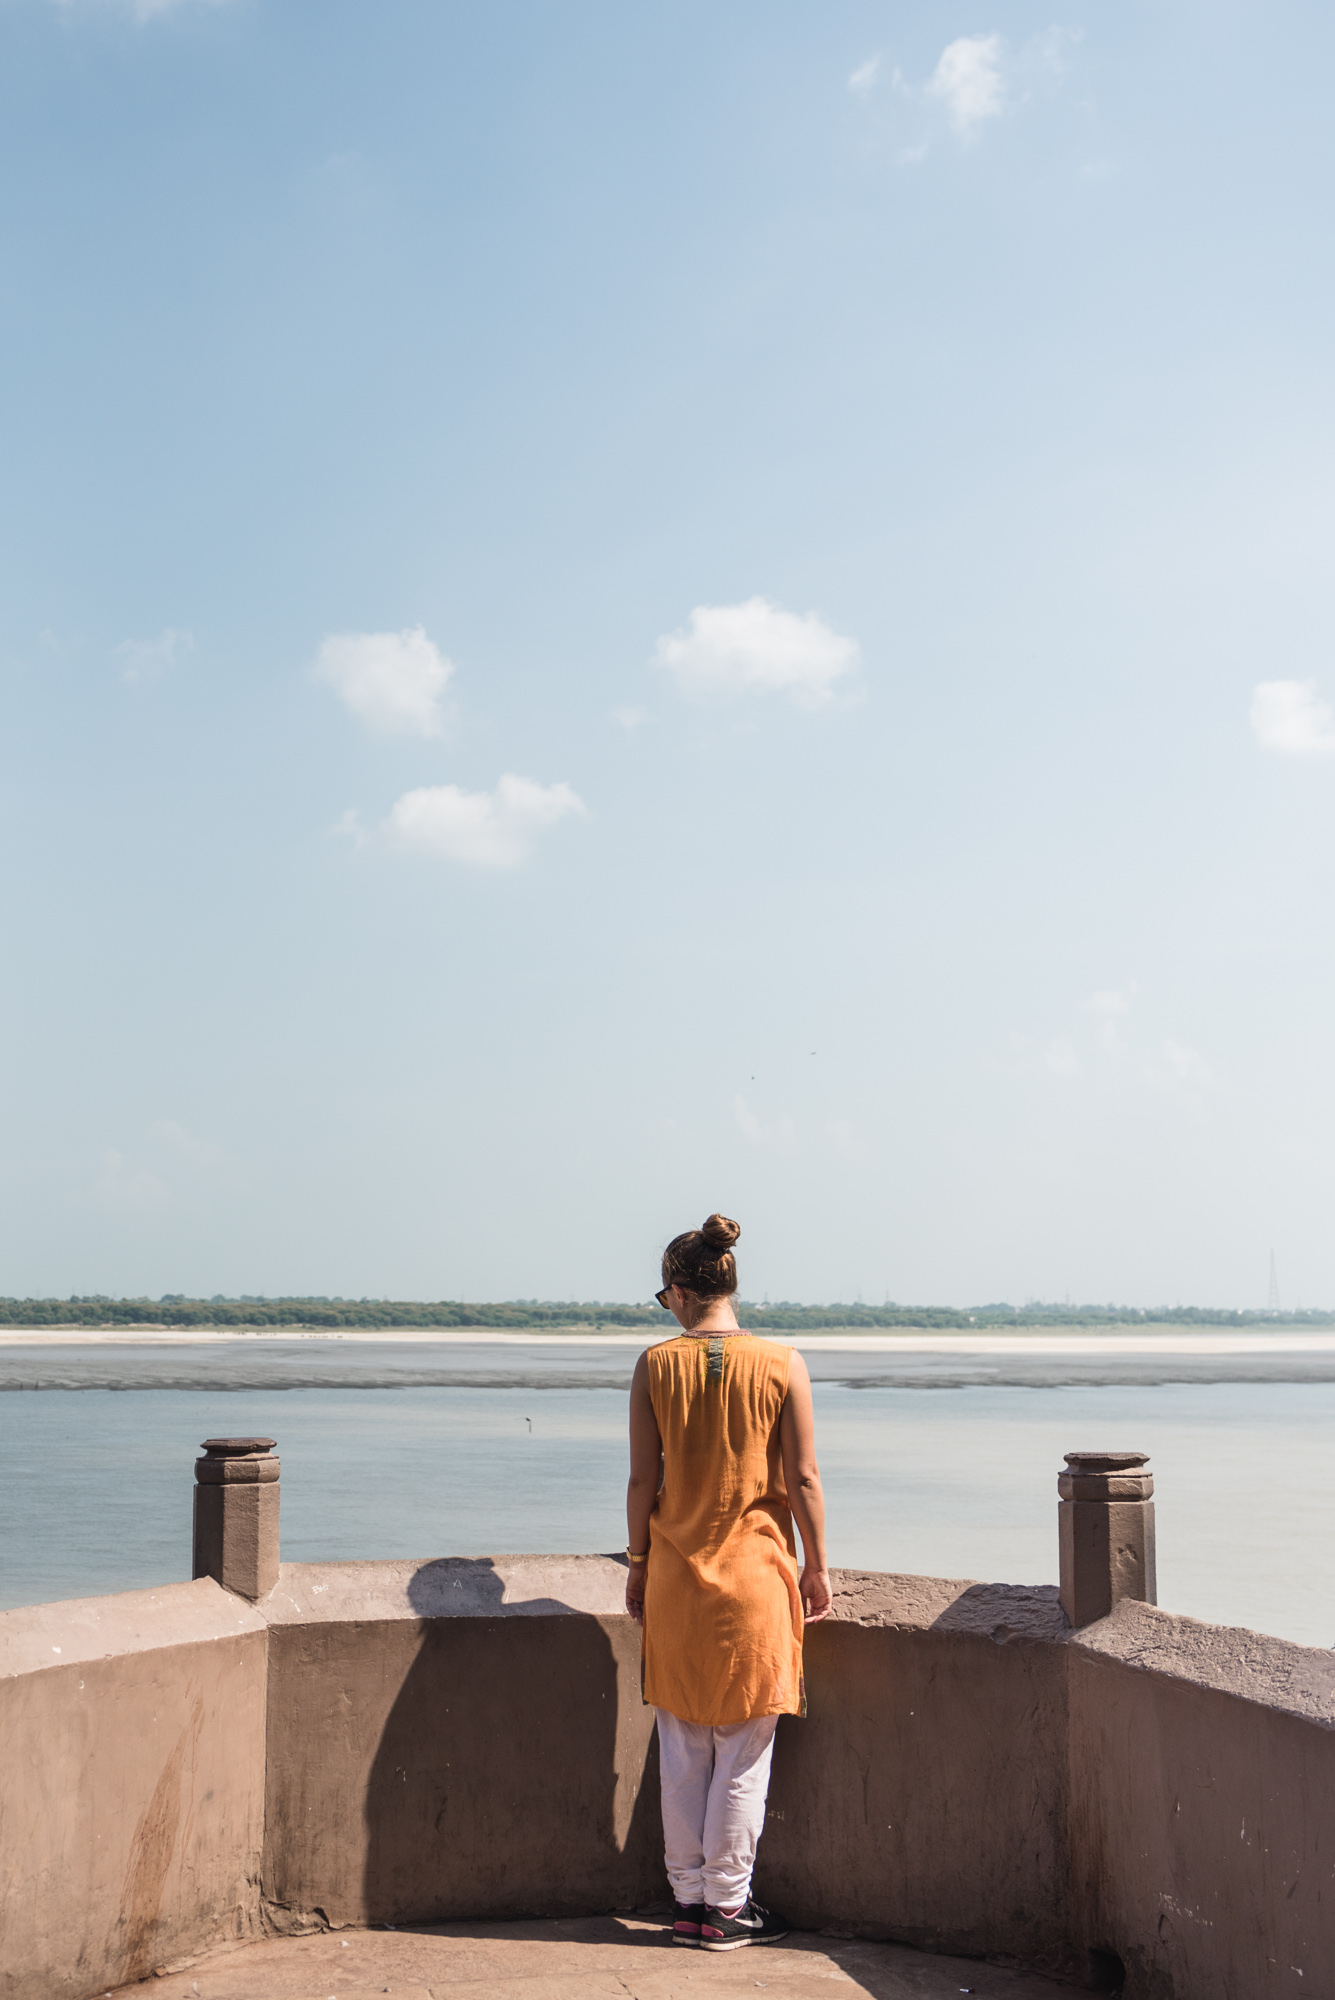 Ganges view at Munshi Ghat, Varanasi